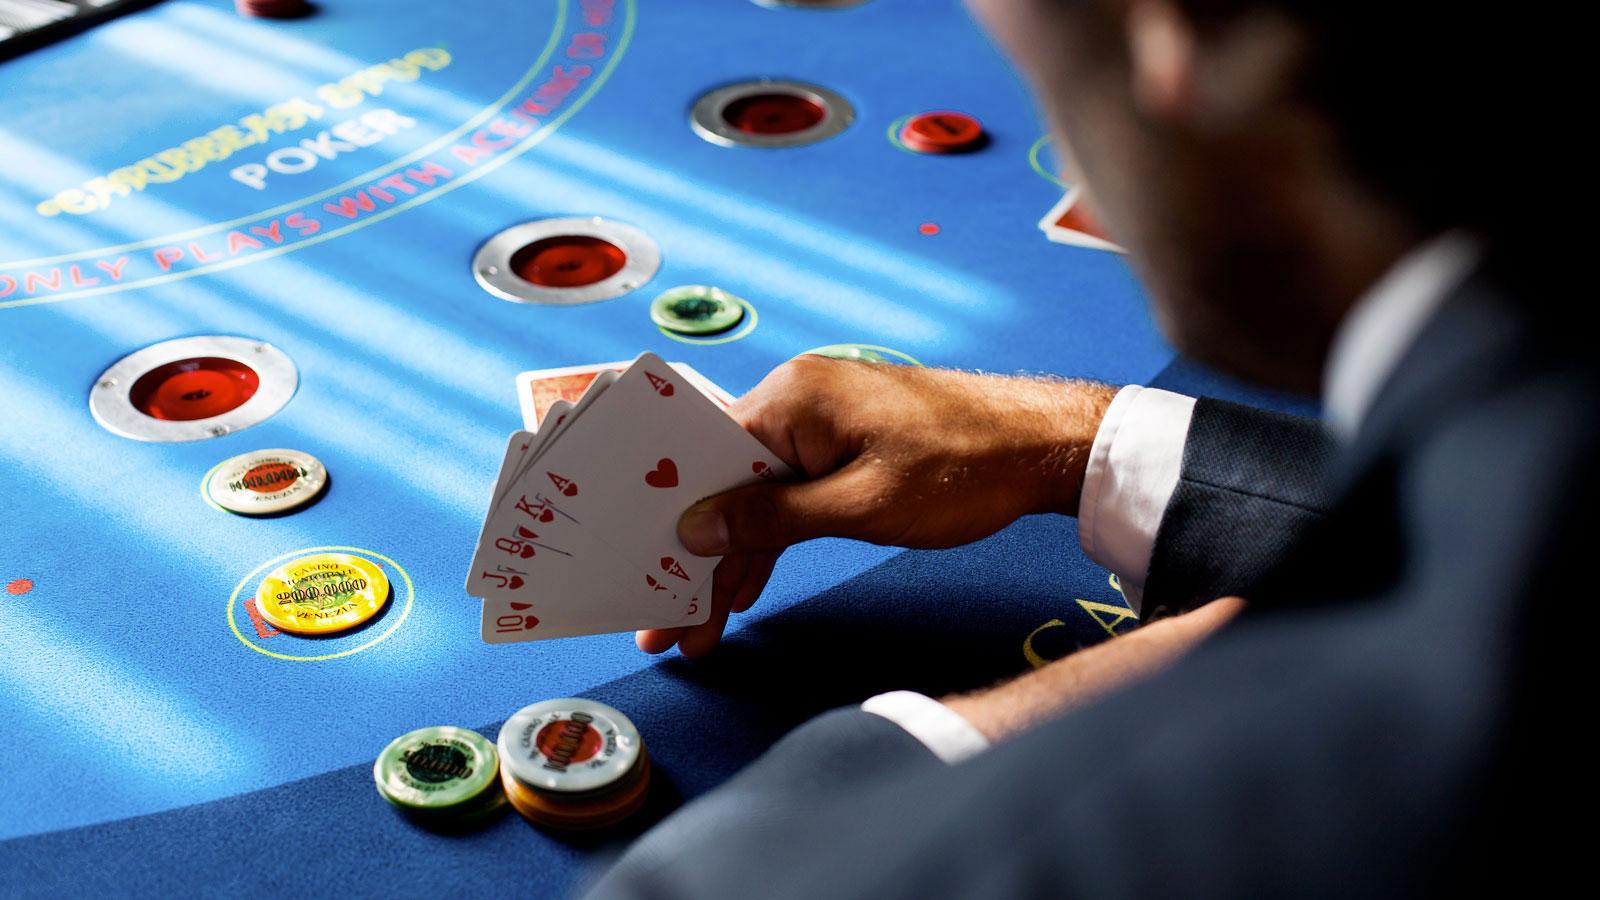 Withdraw Poker Jackpot Terbesar Cepat, Mudah, dan Aman